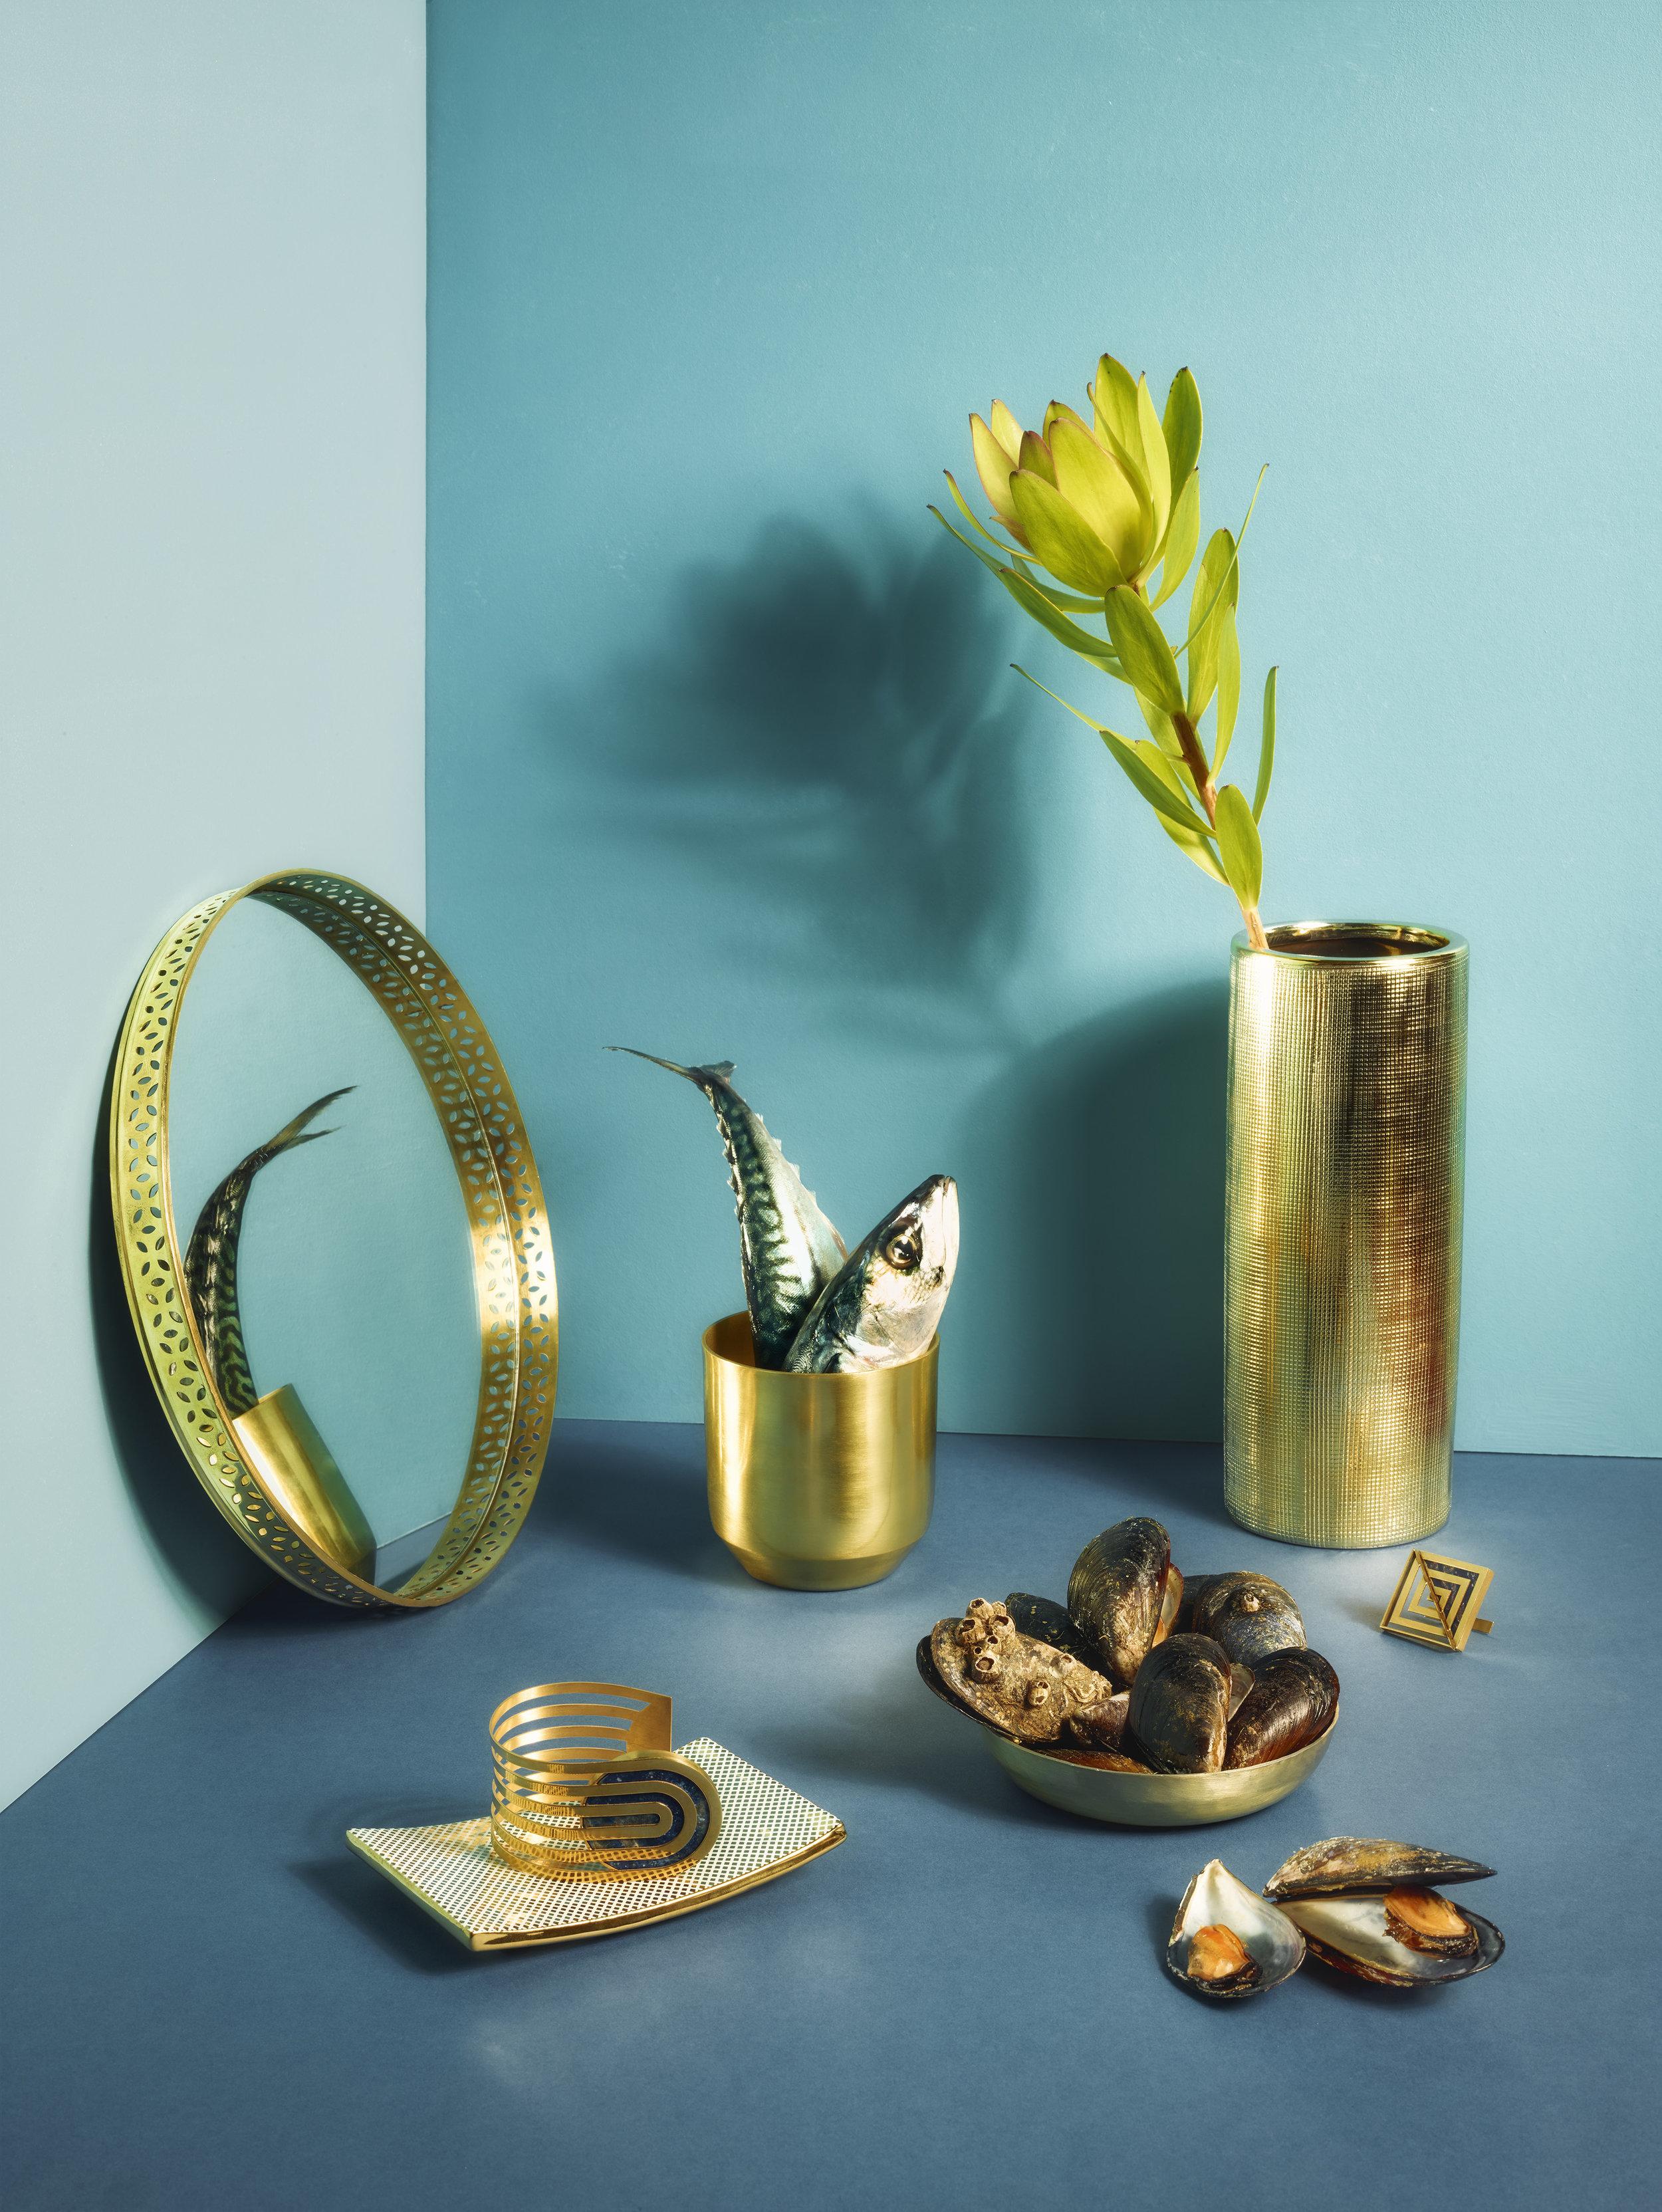 O PEIXE e a JOALHARIA |  Fish and Jewelry